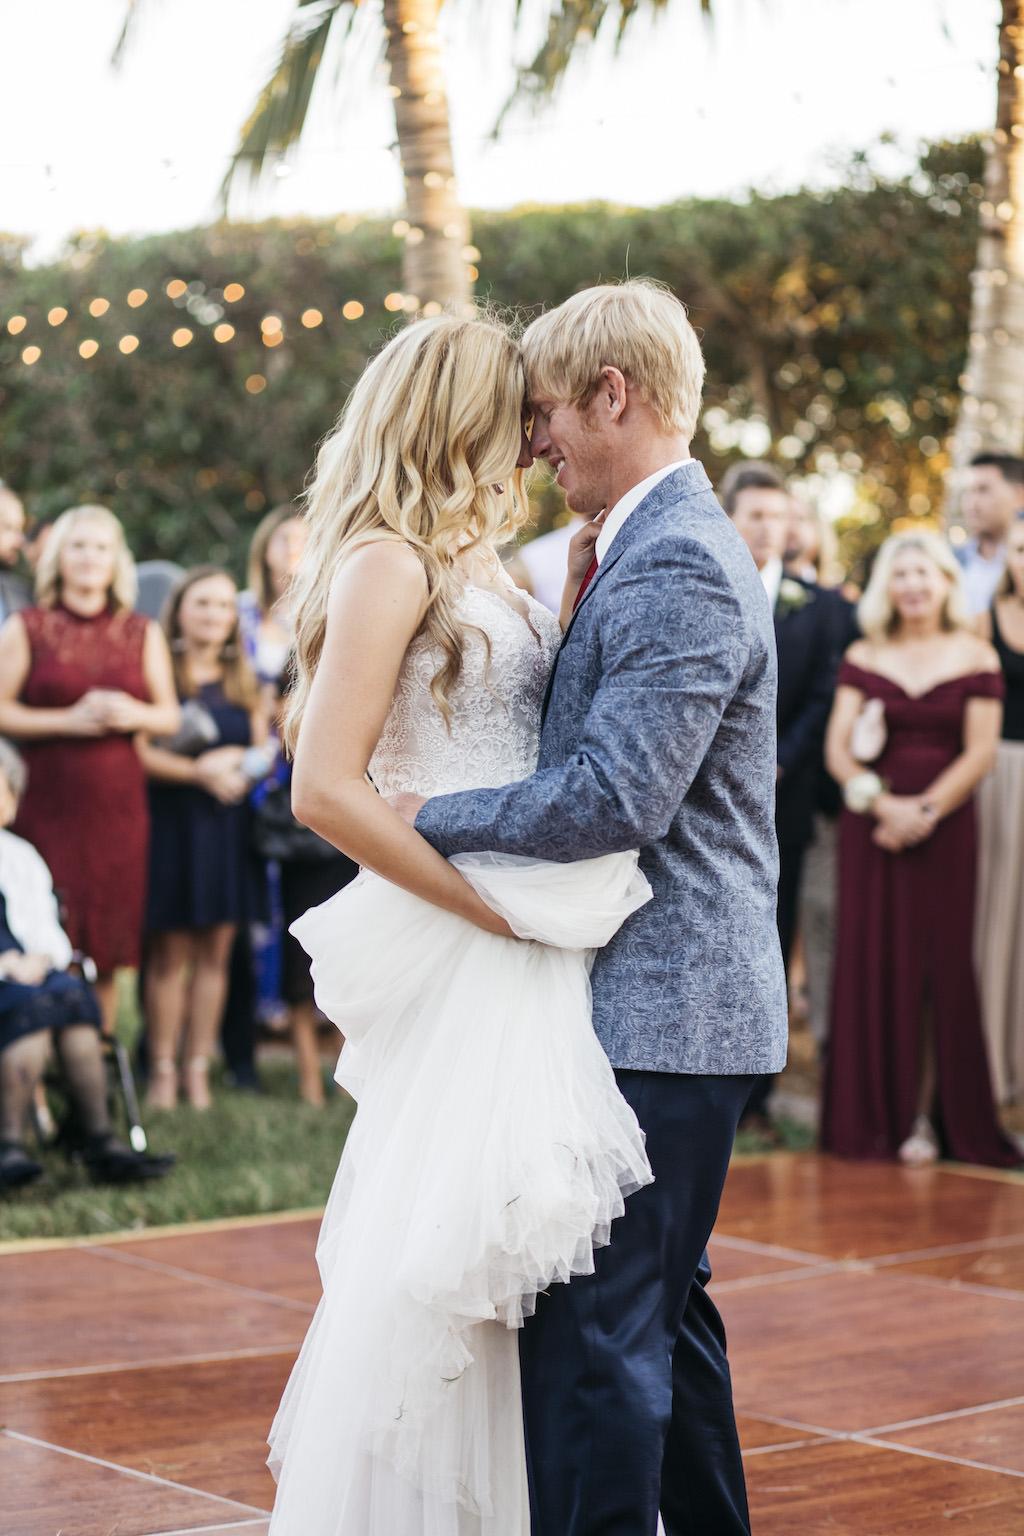 Bride and Groom Wedding Reception First Dance Portrait